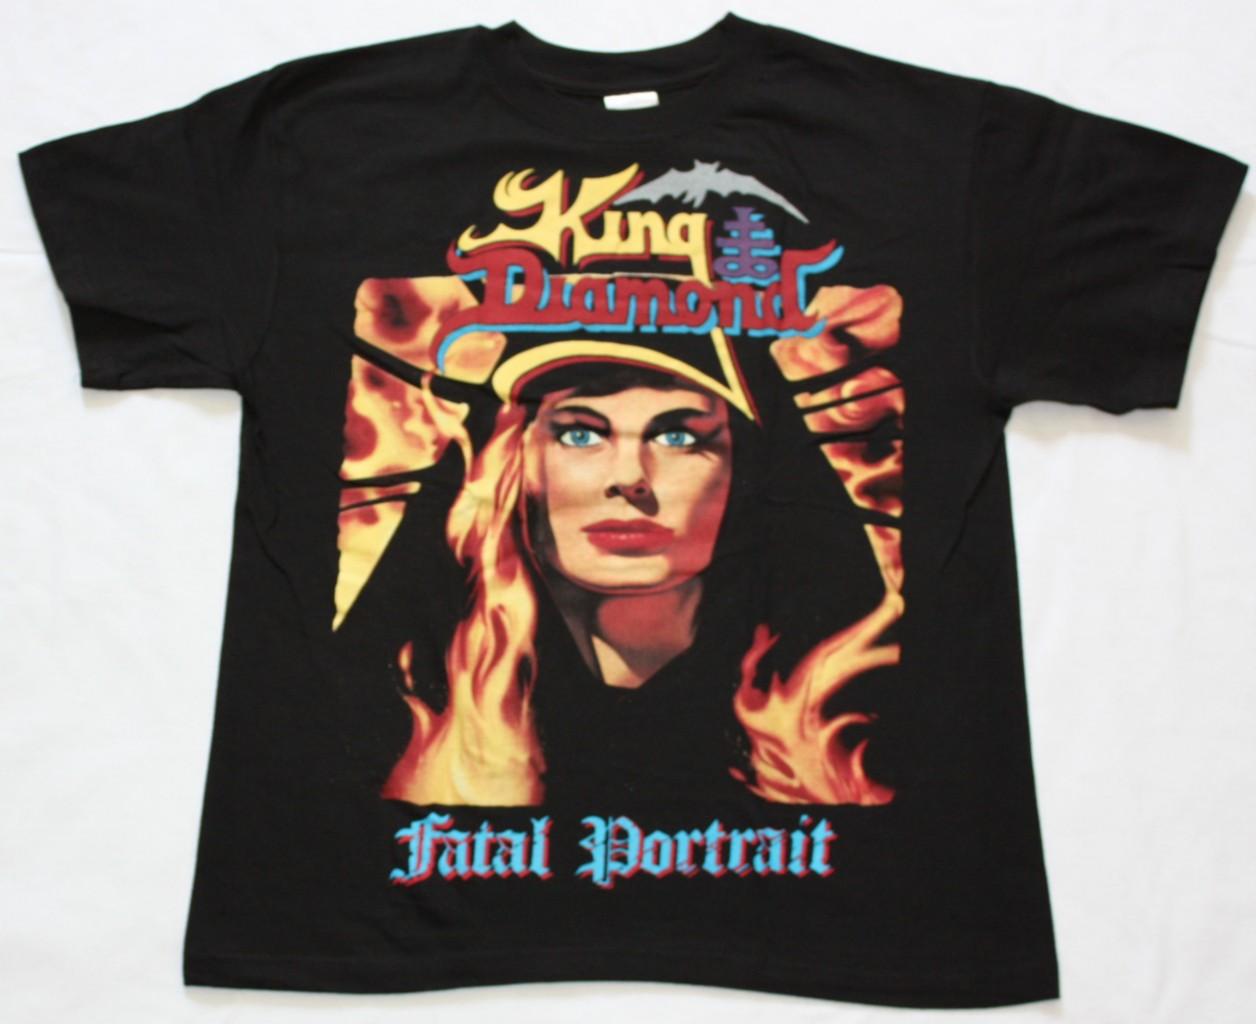 KING DIAMOND FATAL PORTRAIT'86 NEW BLACK T-SHIRT